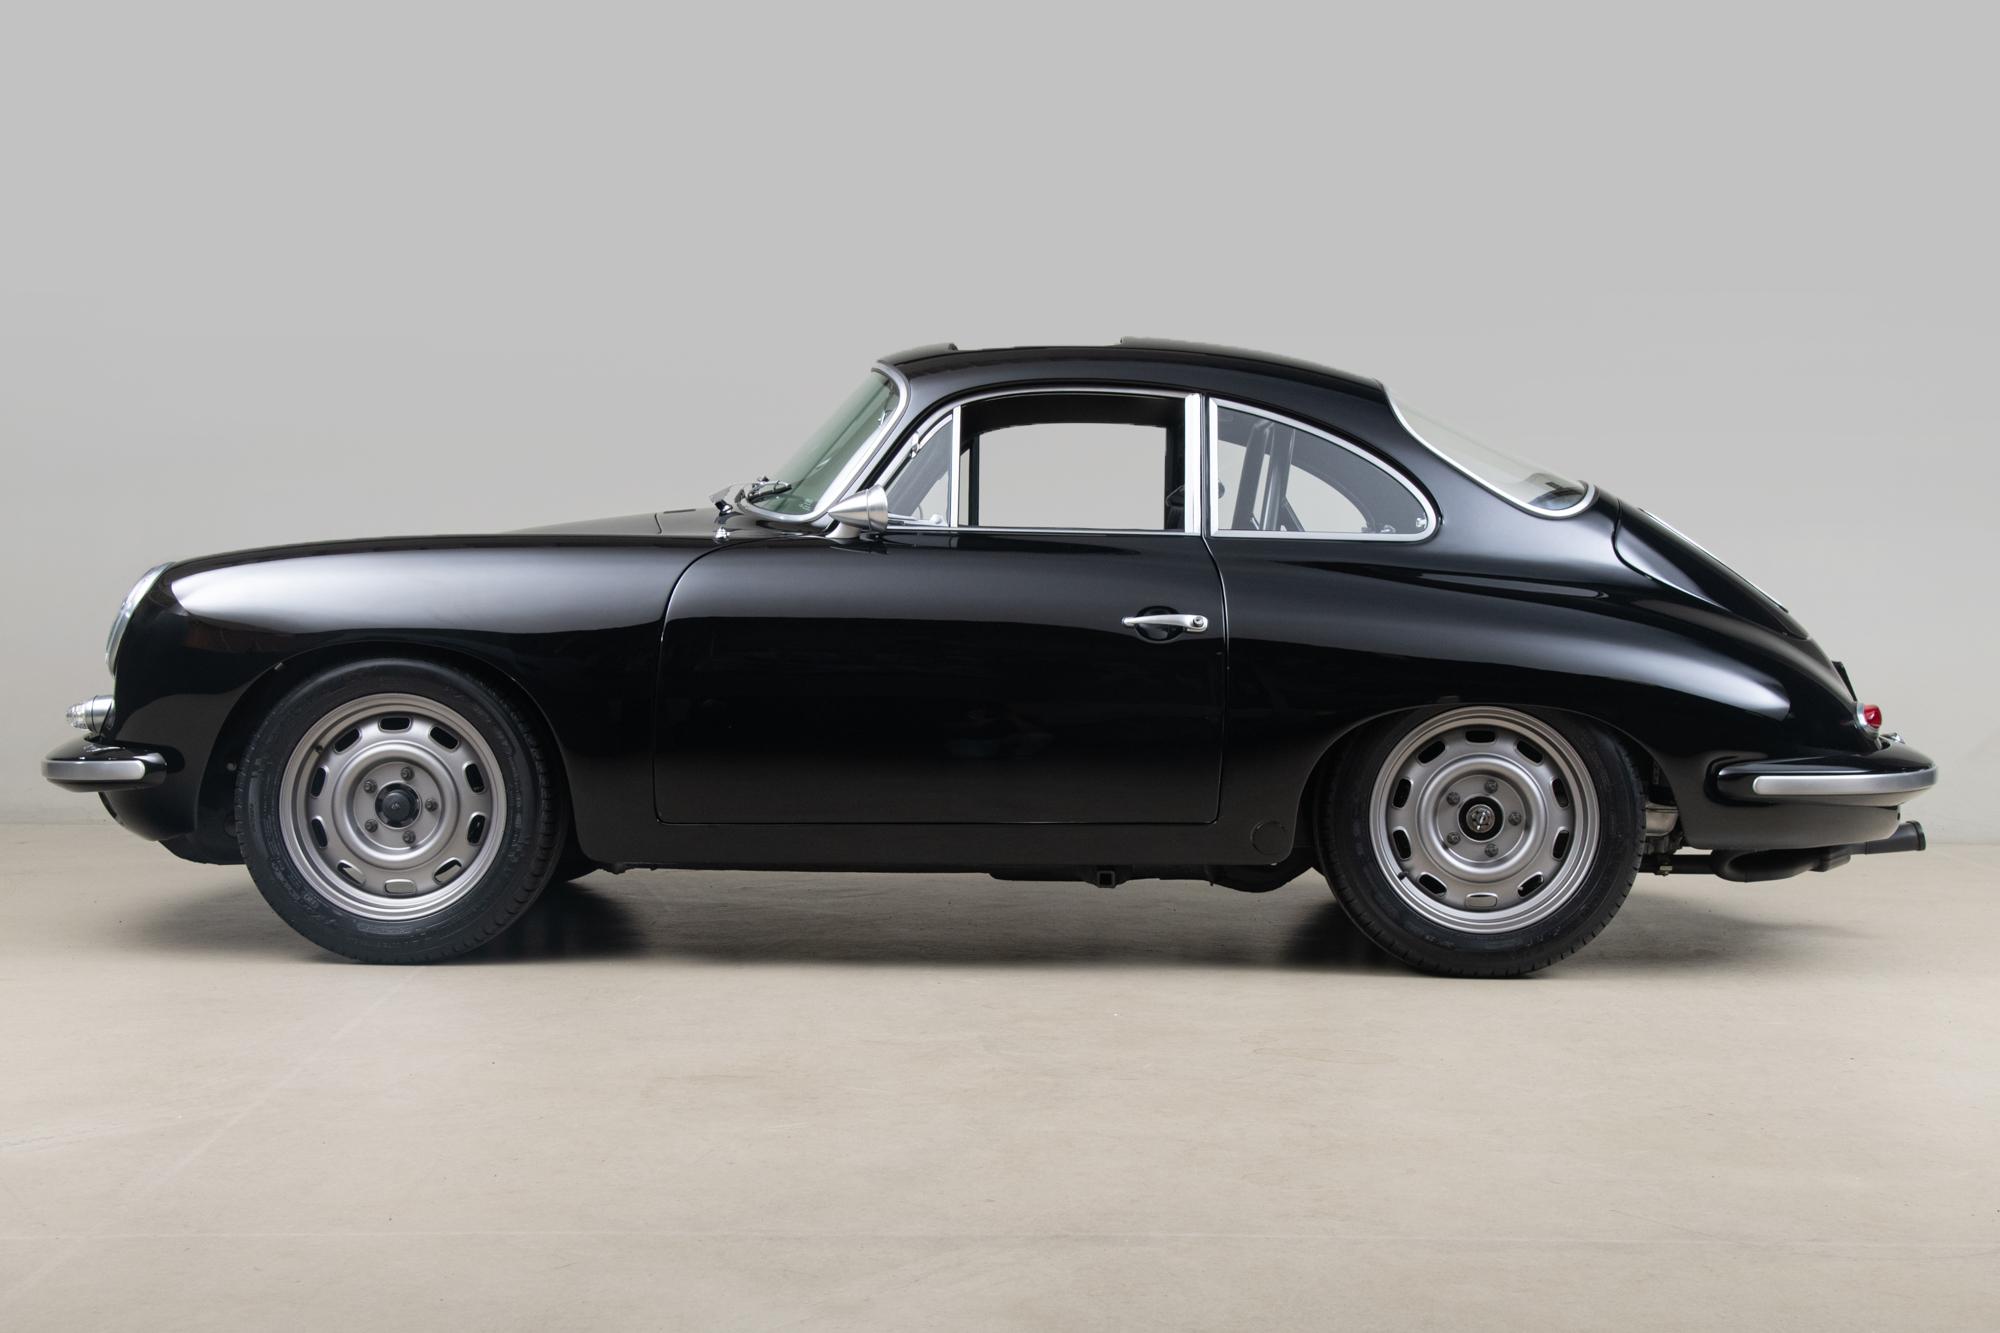 1963 Porsche 356B Outlaw, BLACK, VIN 121562, MILEAGE 6437